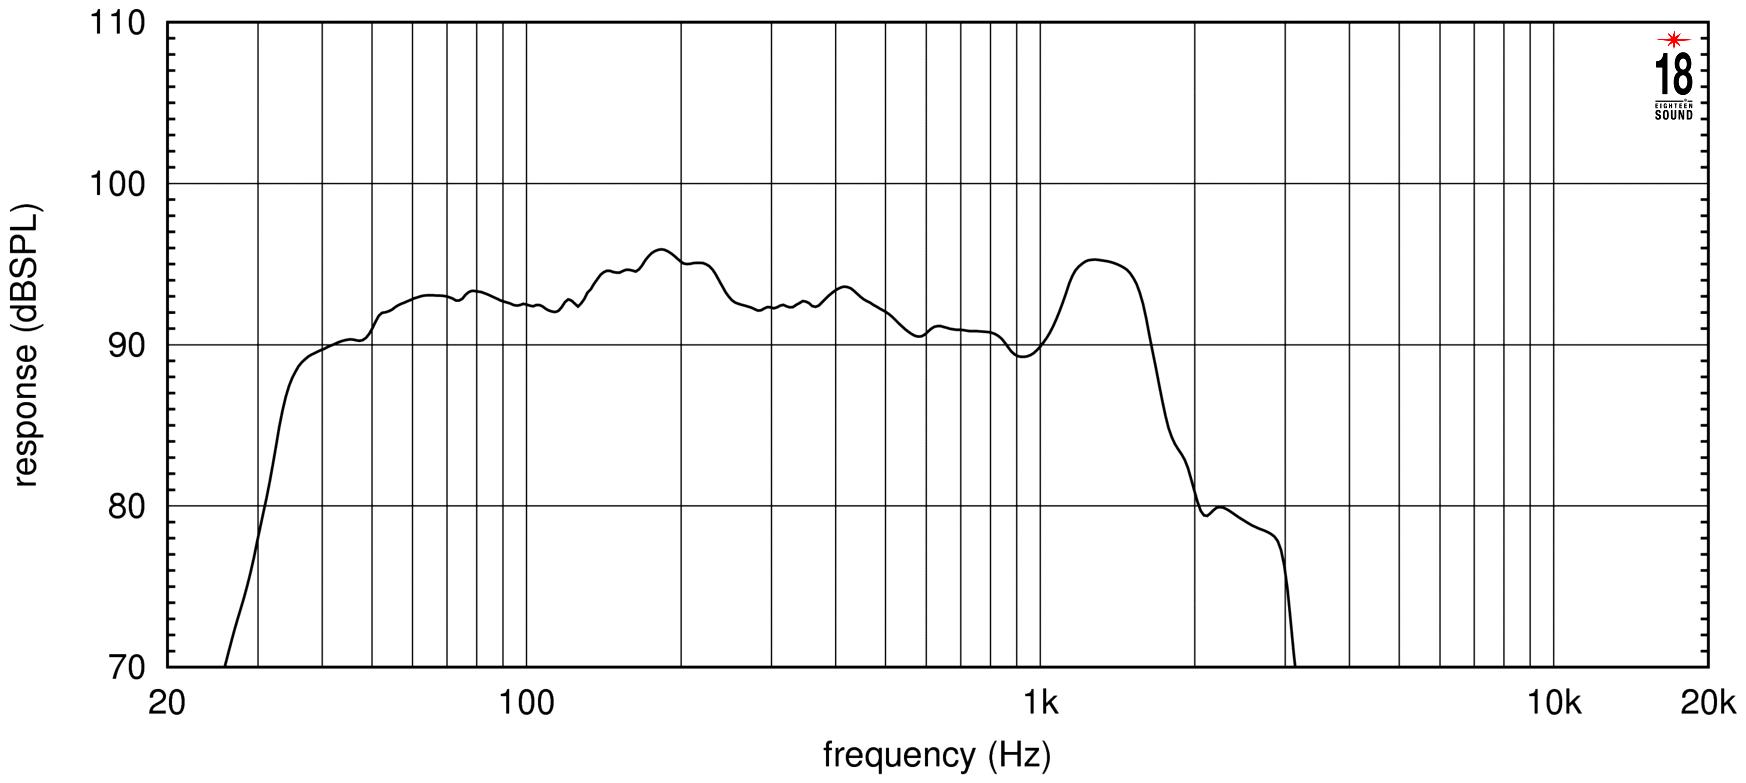 Eighteen Sound 18LW2500 - 18